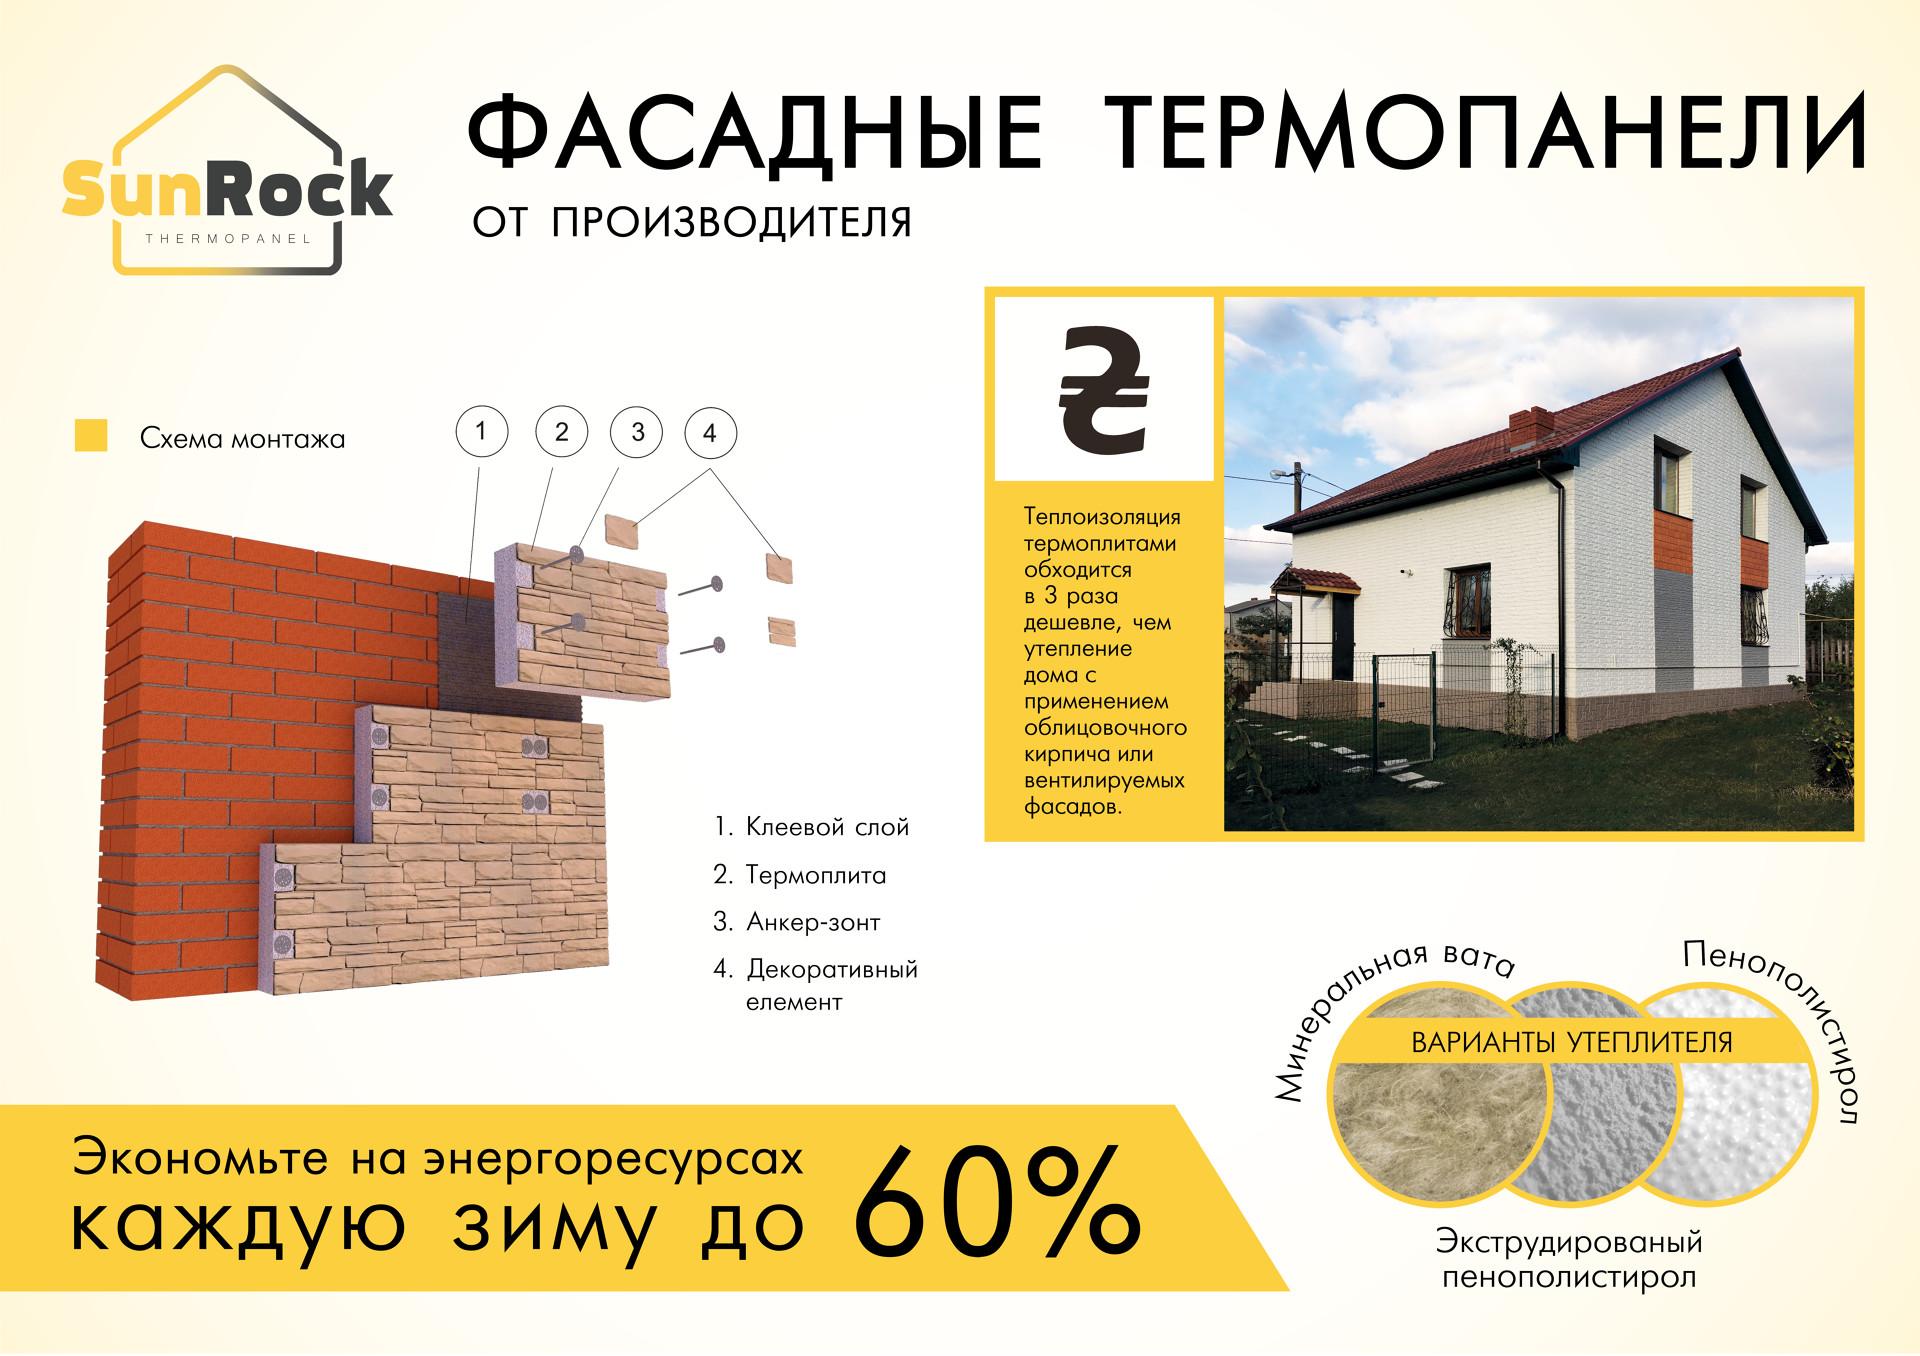 Термопанели для фасада дома - плюсы и минусы